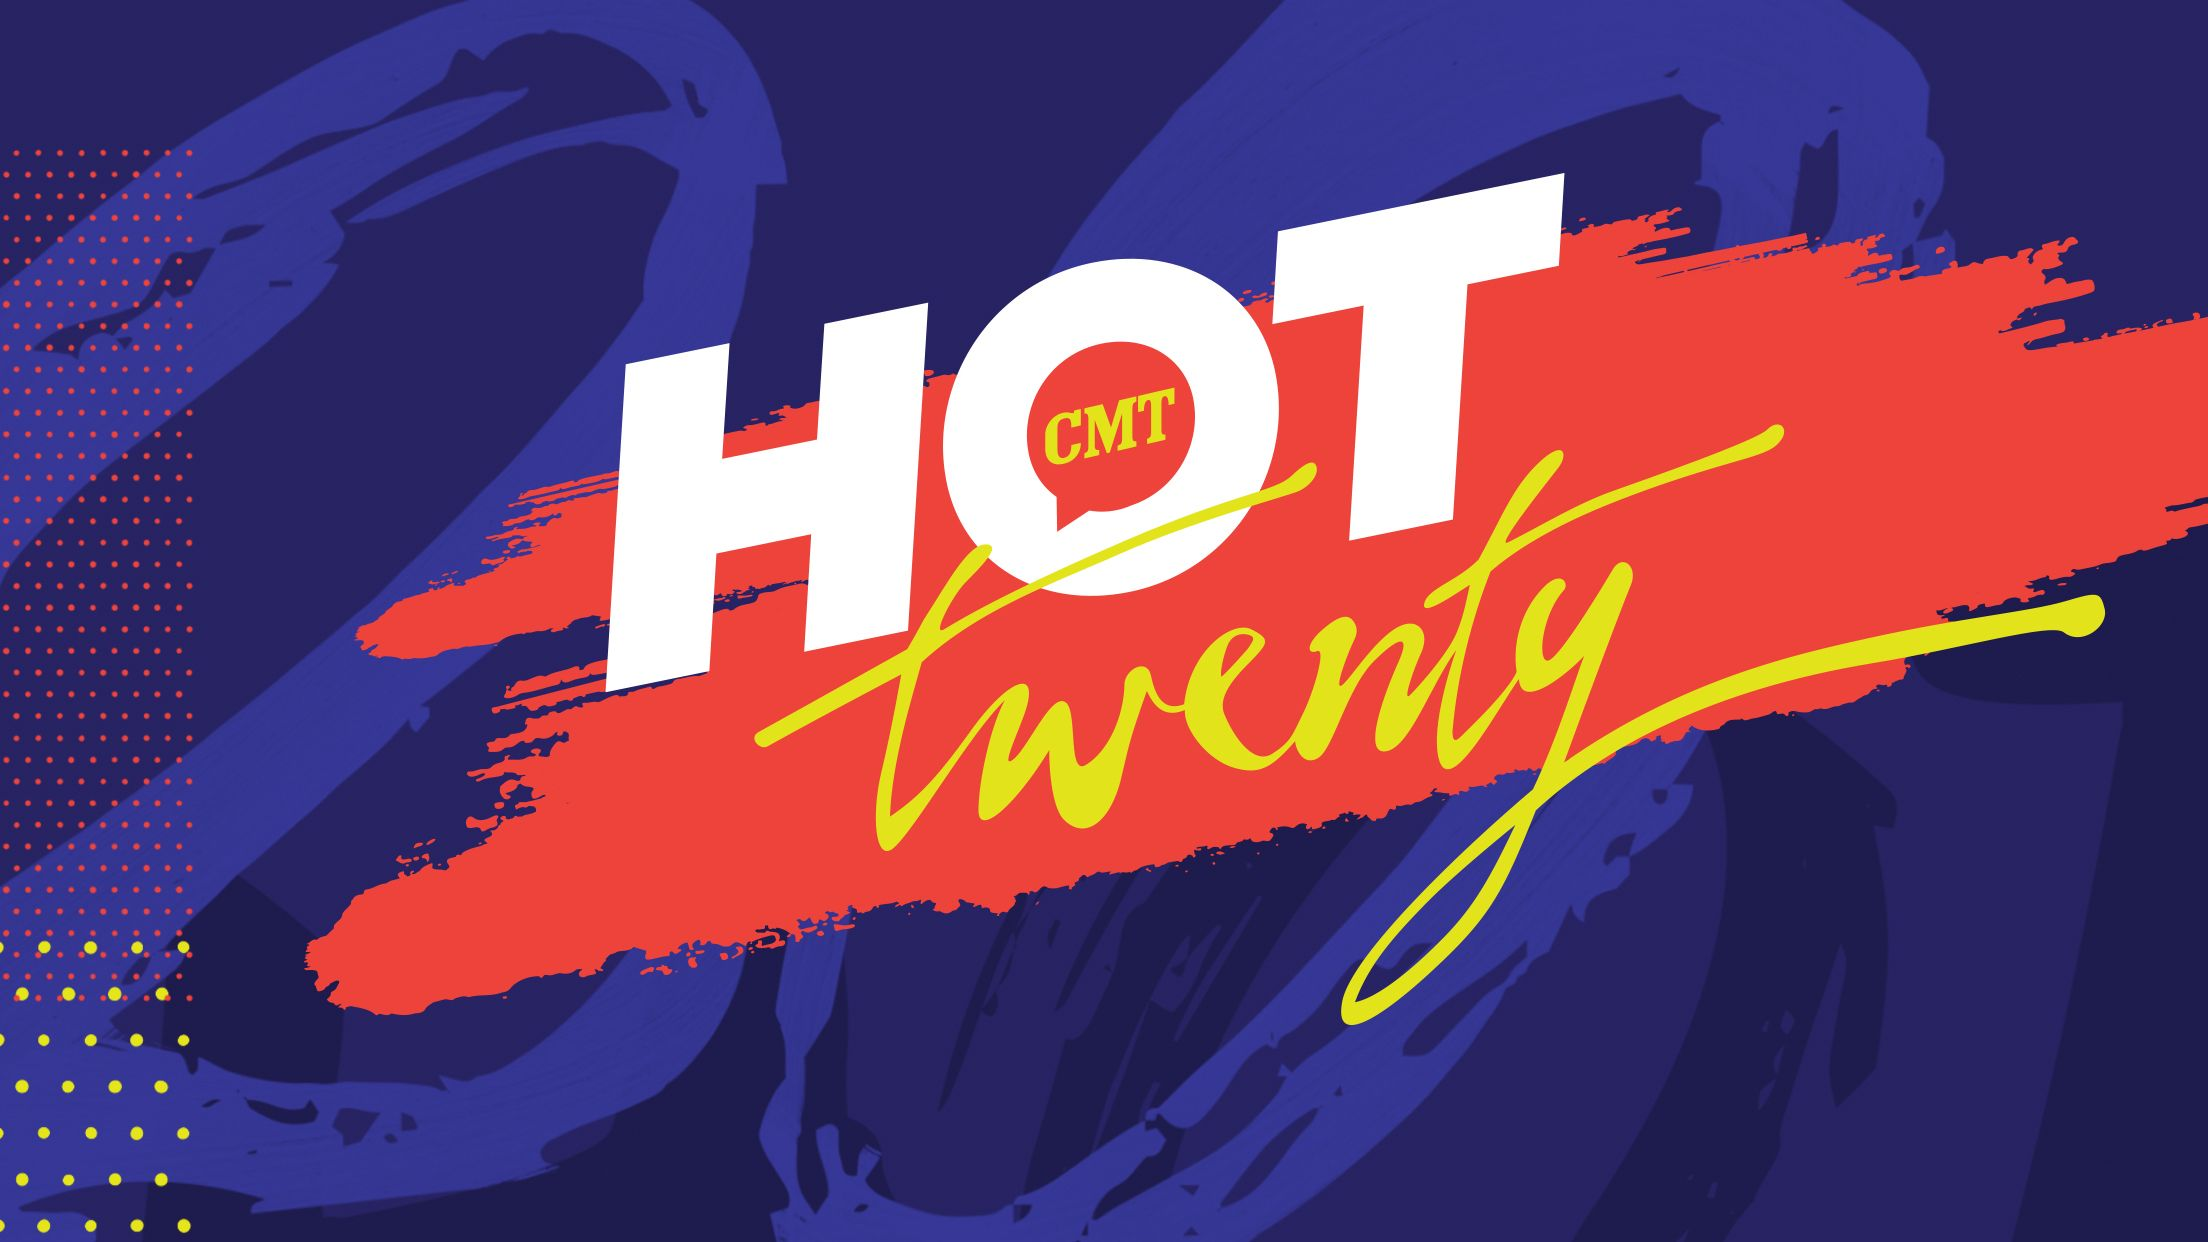 CMT Hot 20 Countdown | Episodes (TV Series) | CMT